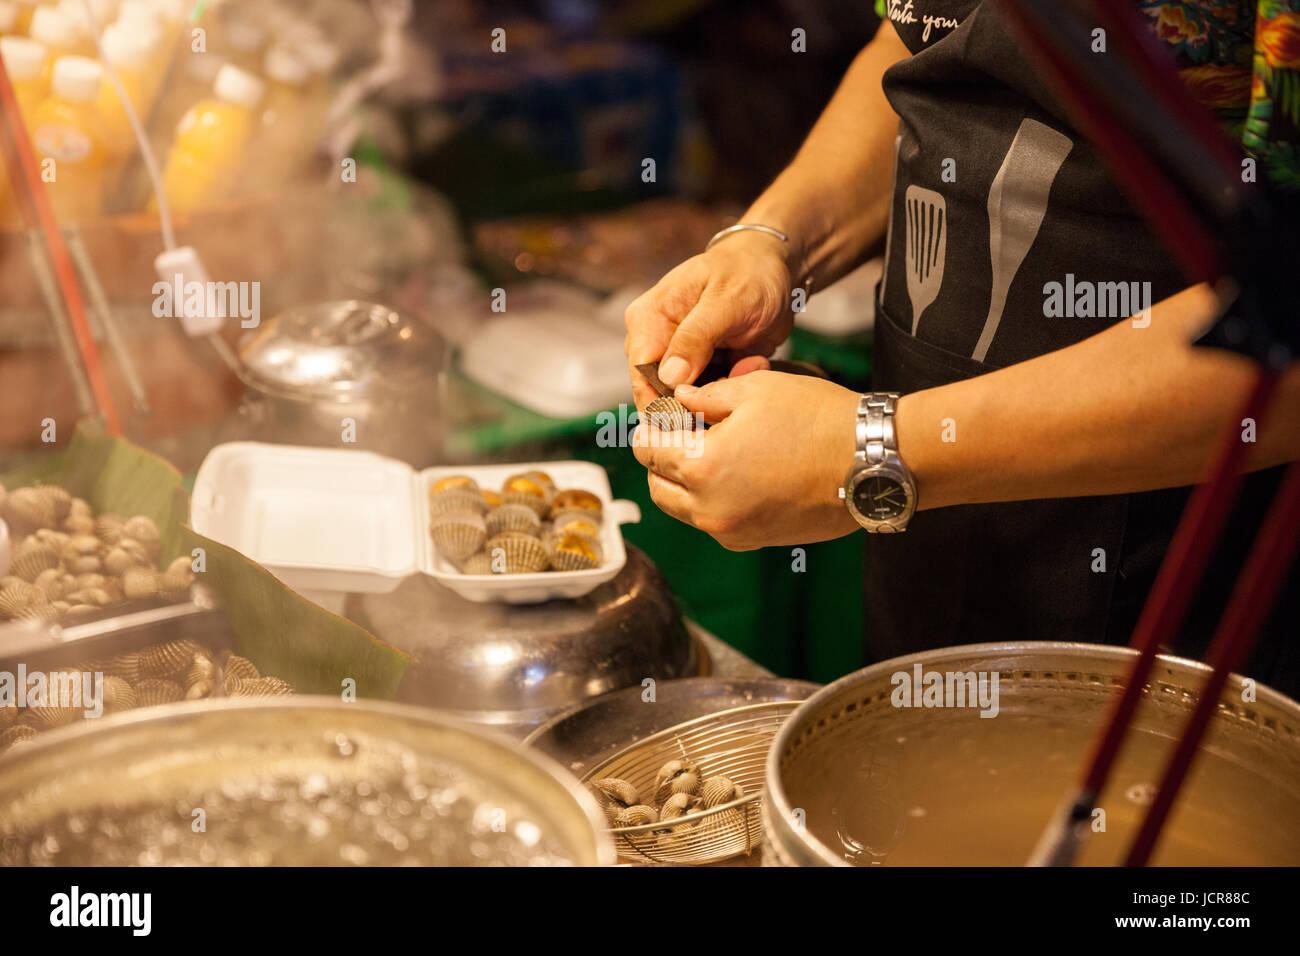 CHIANG MAI, THAILAND - 27 AUGUST: Mann bereiten Muscheln zum Verkauf auf dem Sonntagsmarkt (Walking Street) am 27. Stockbild